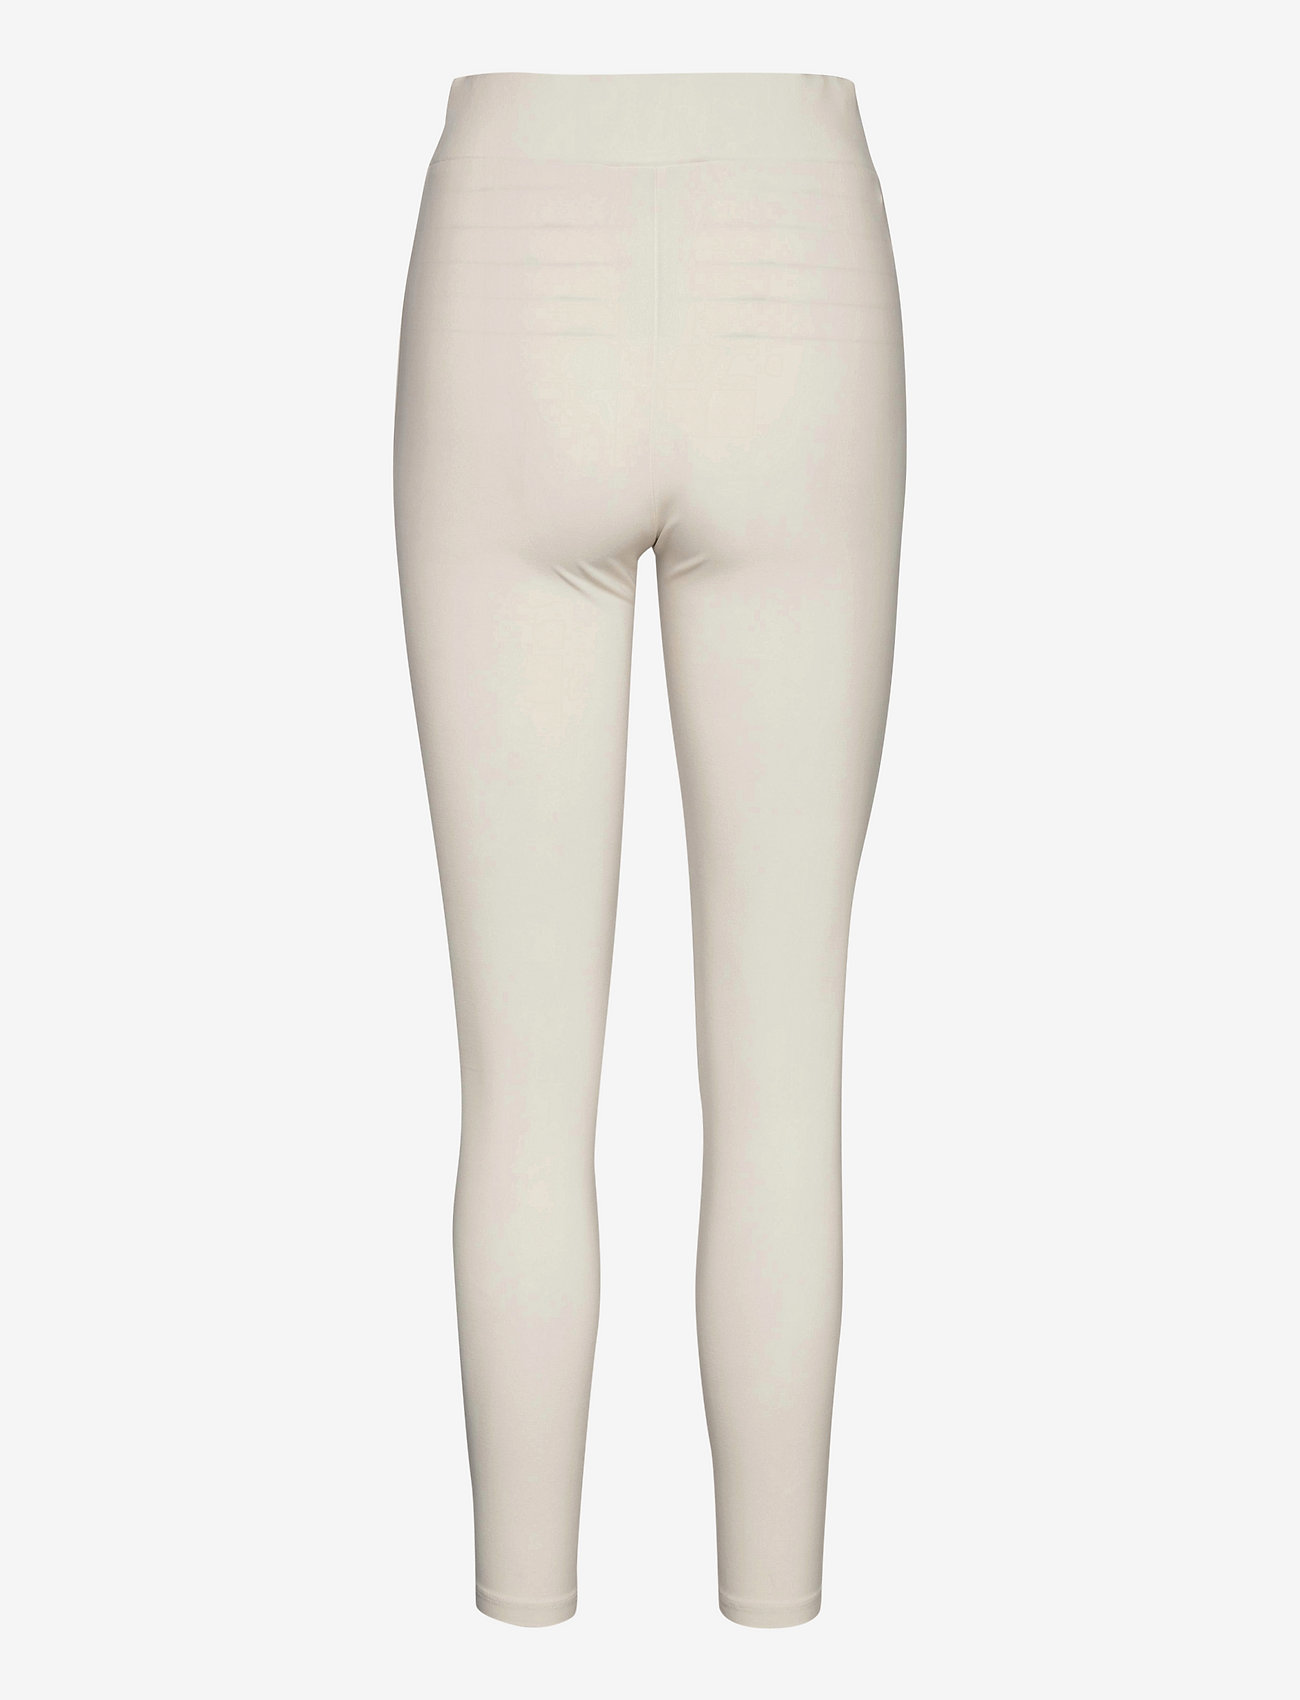 Max Mara Leisure - BAHAMAS - leggings - white - 1